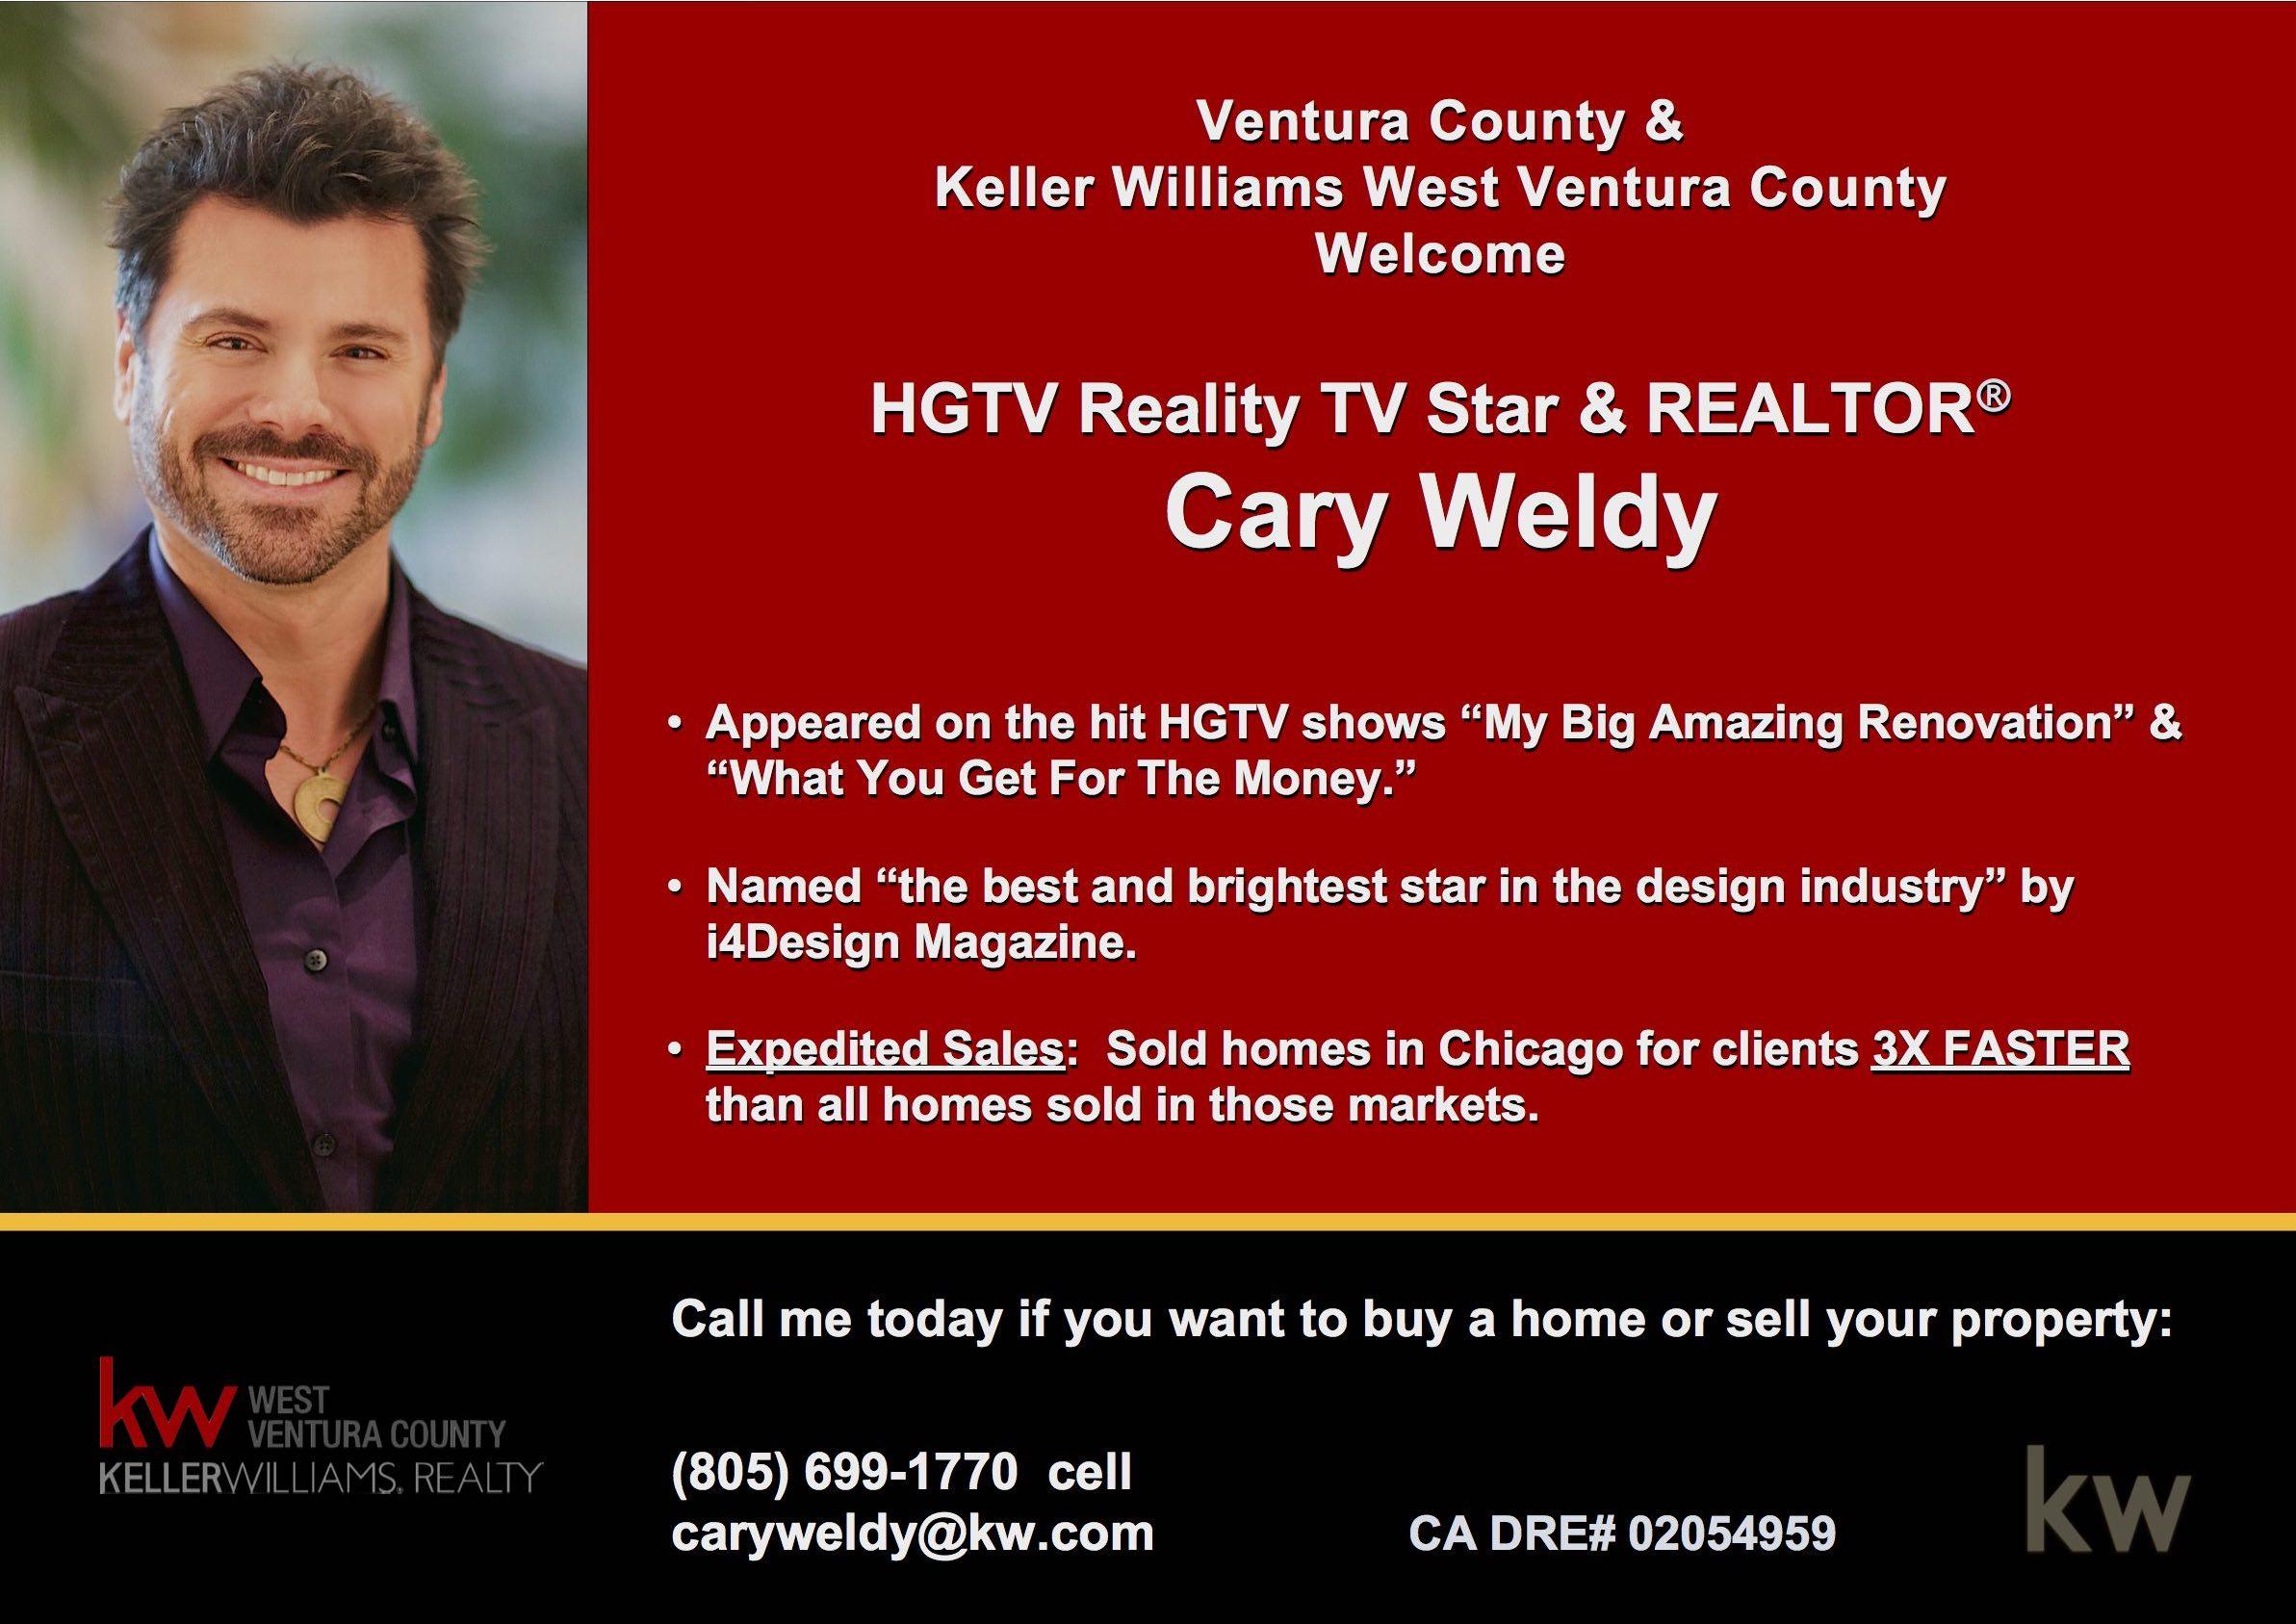 Cary Weldy ad - intro to Ventura County   4-28-18.jpg